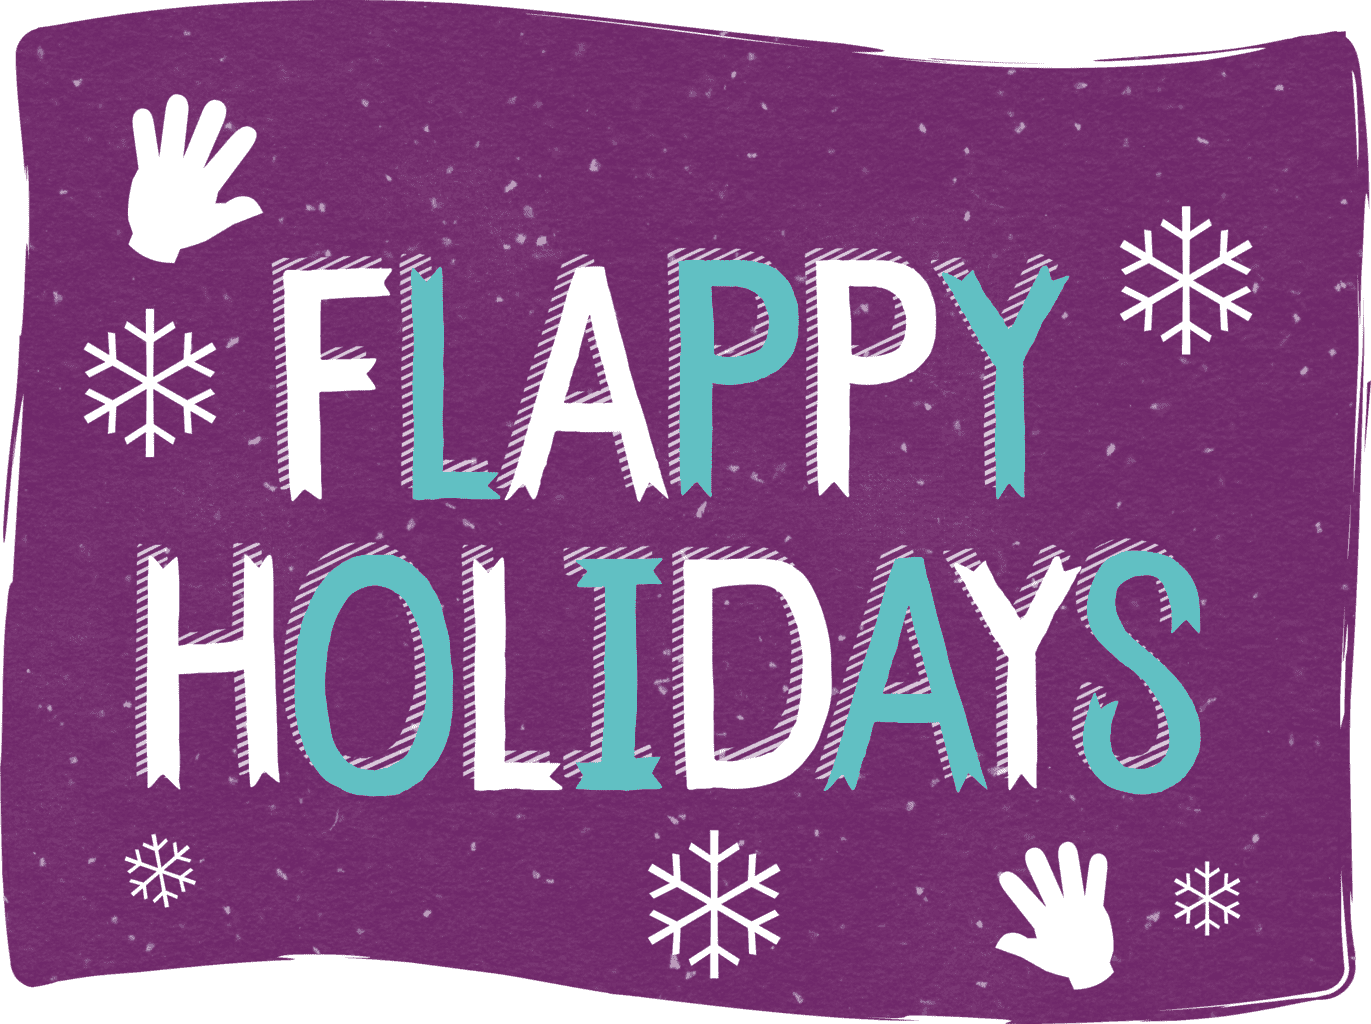 Flappy Holidays